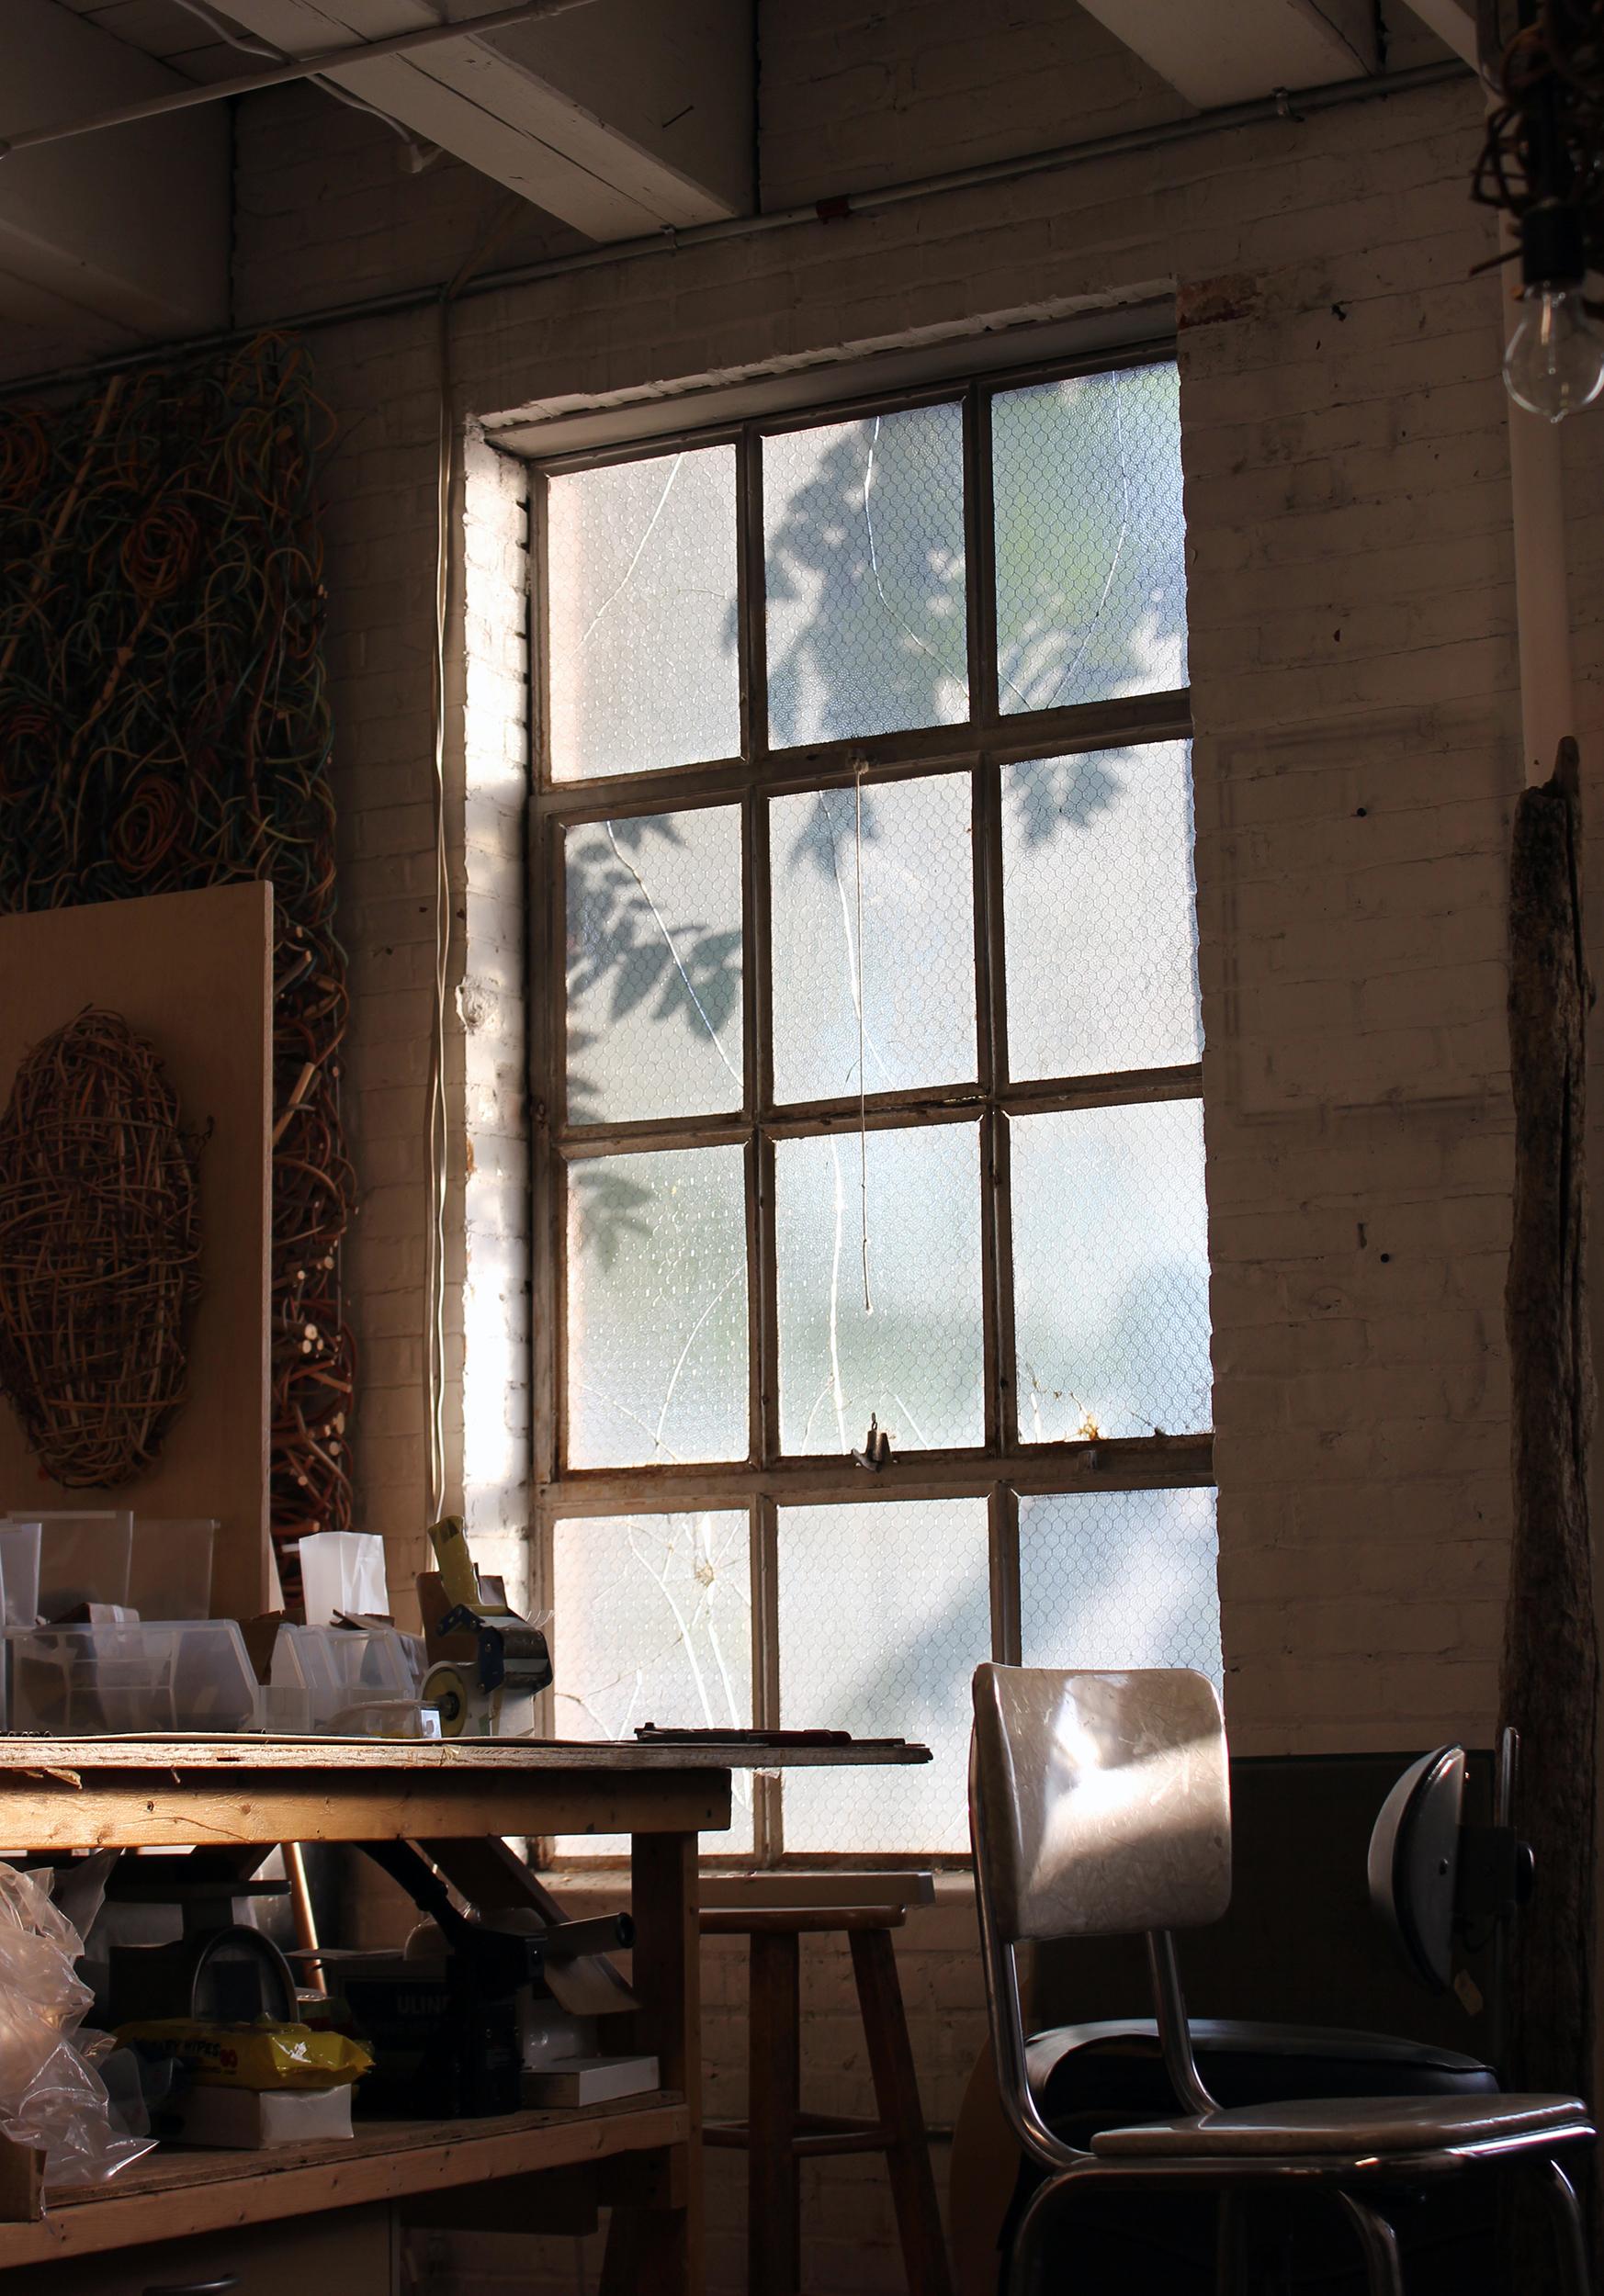 Studio Window_web.jpg